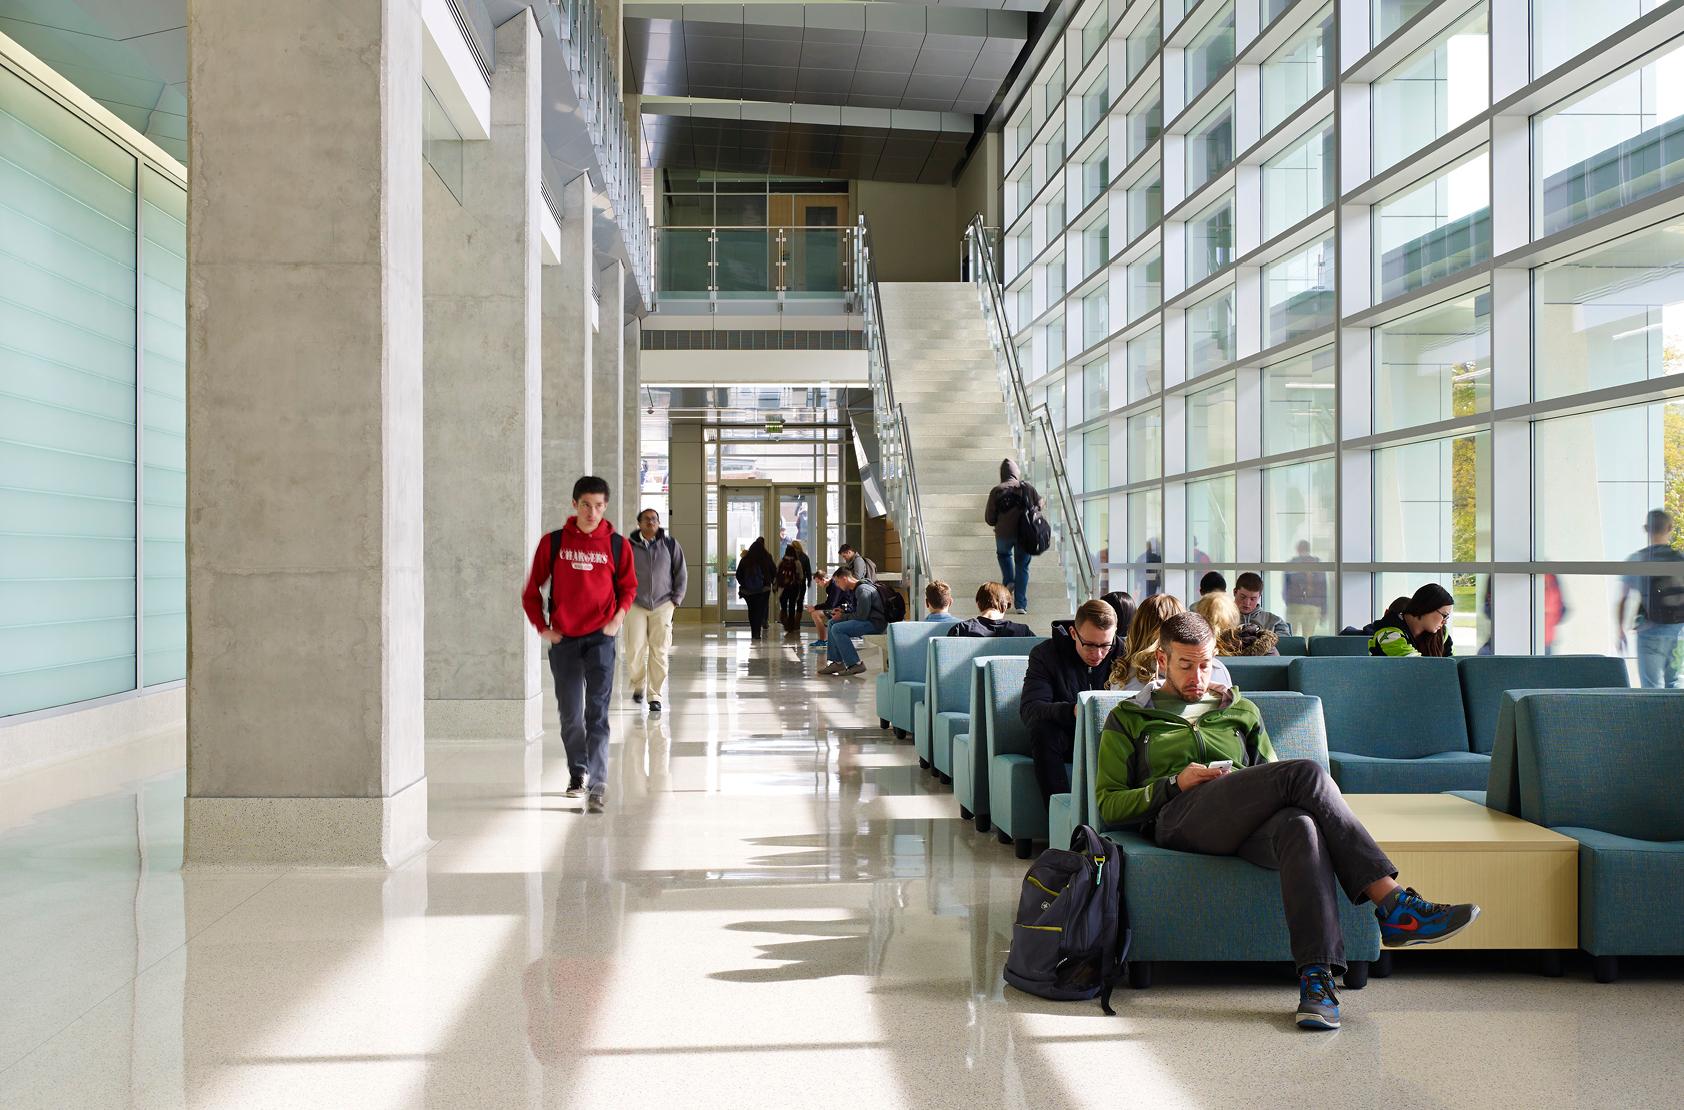 University of Wisconsin - Milwaukee - Kenwood Interdisciplinary Research Center